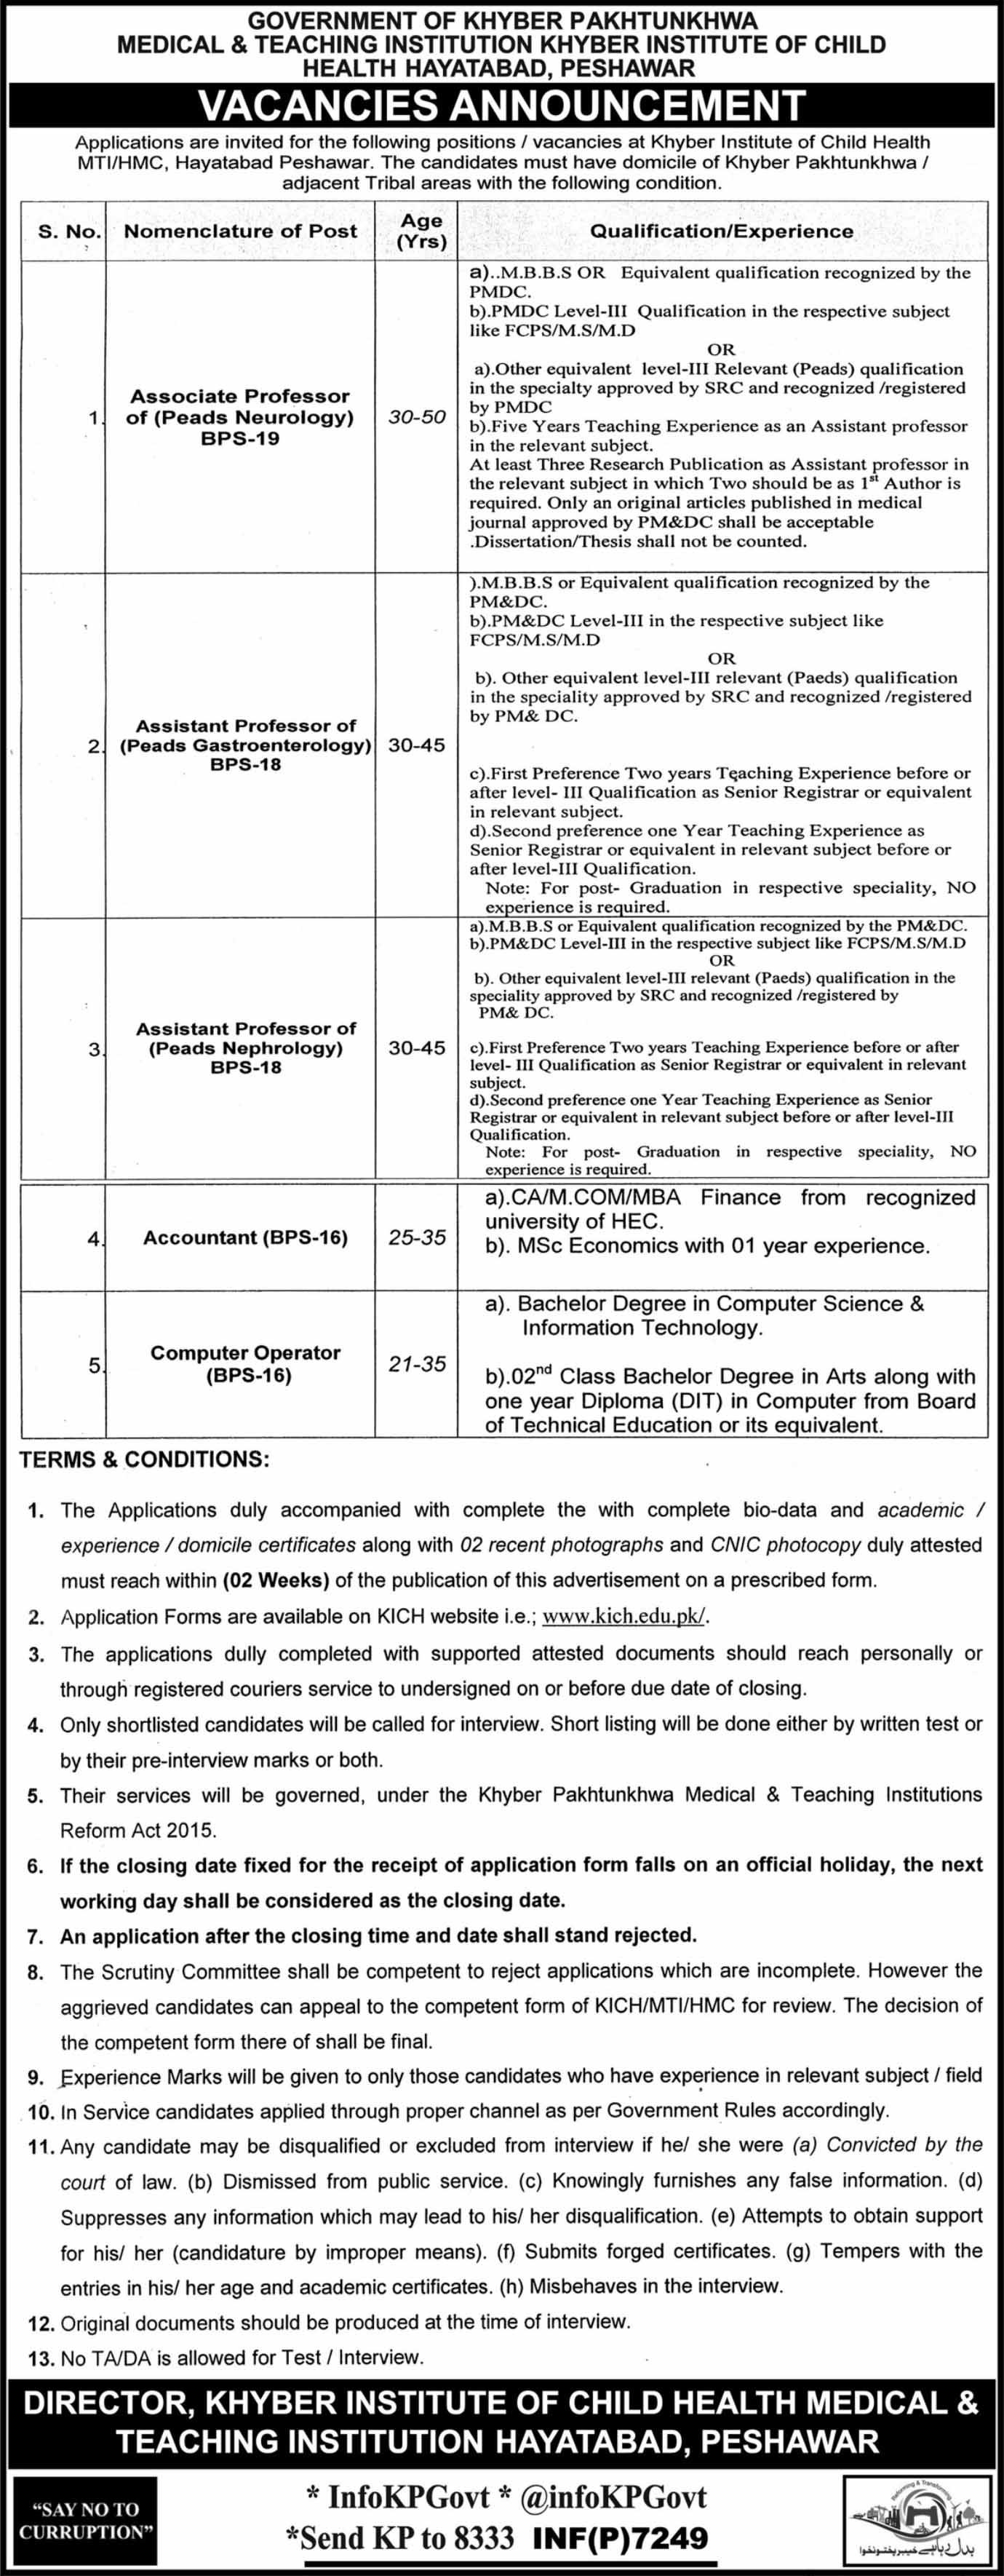 Hayatabad Medical & Teaching Institution Khyber Institute of Child Health 06 Jobs, 26 December 2017 Mashriq Newspaper